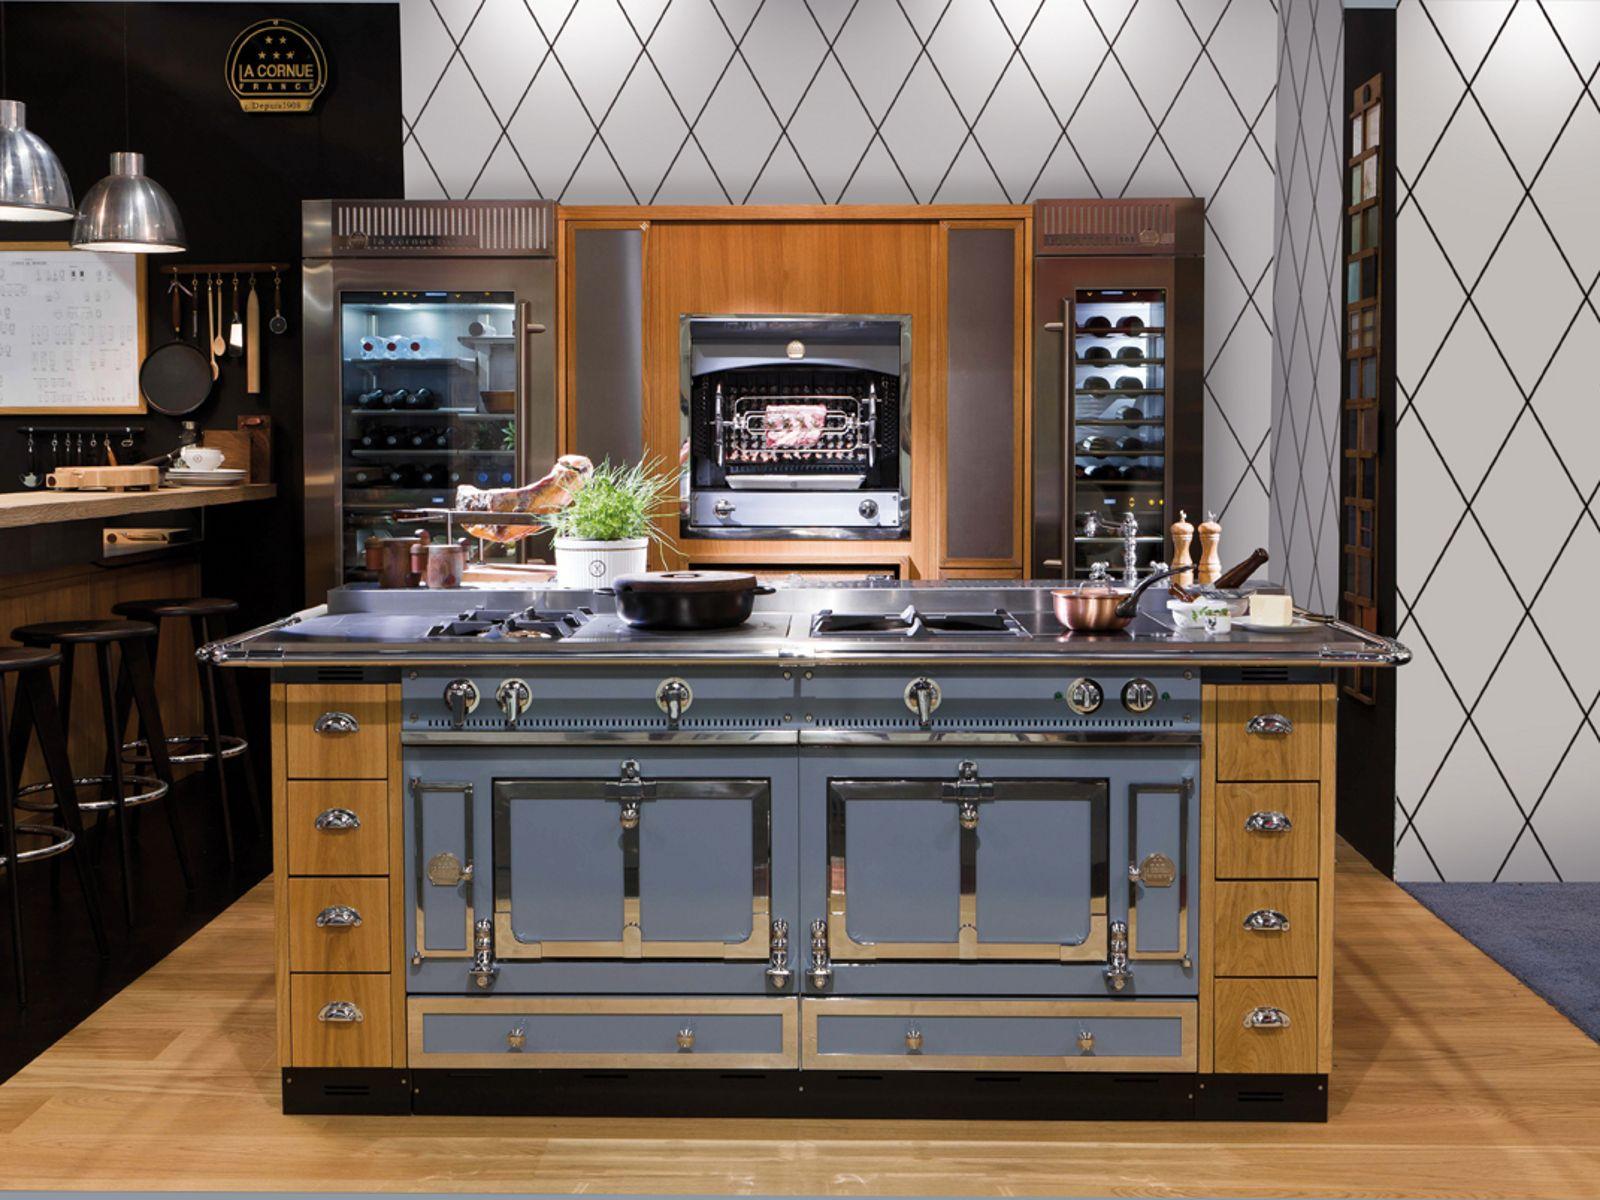 Stainless steel cooker ch teau 150 by la cornue for Piano de cuisine la cornue